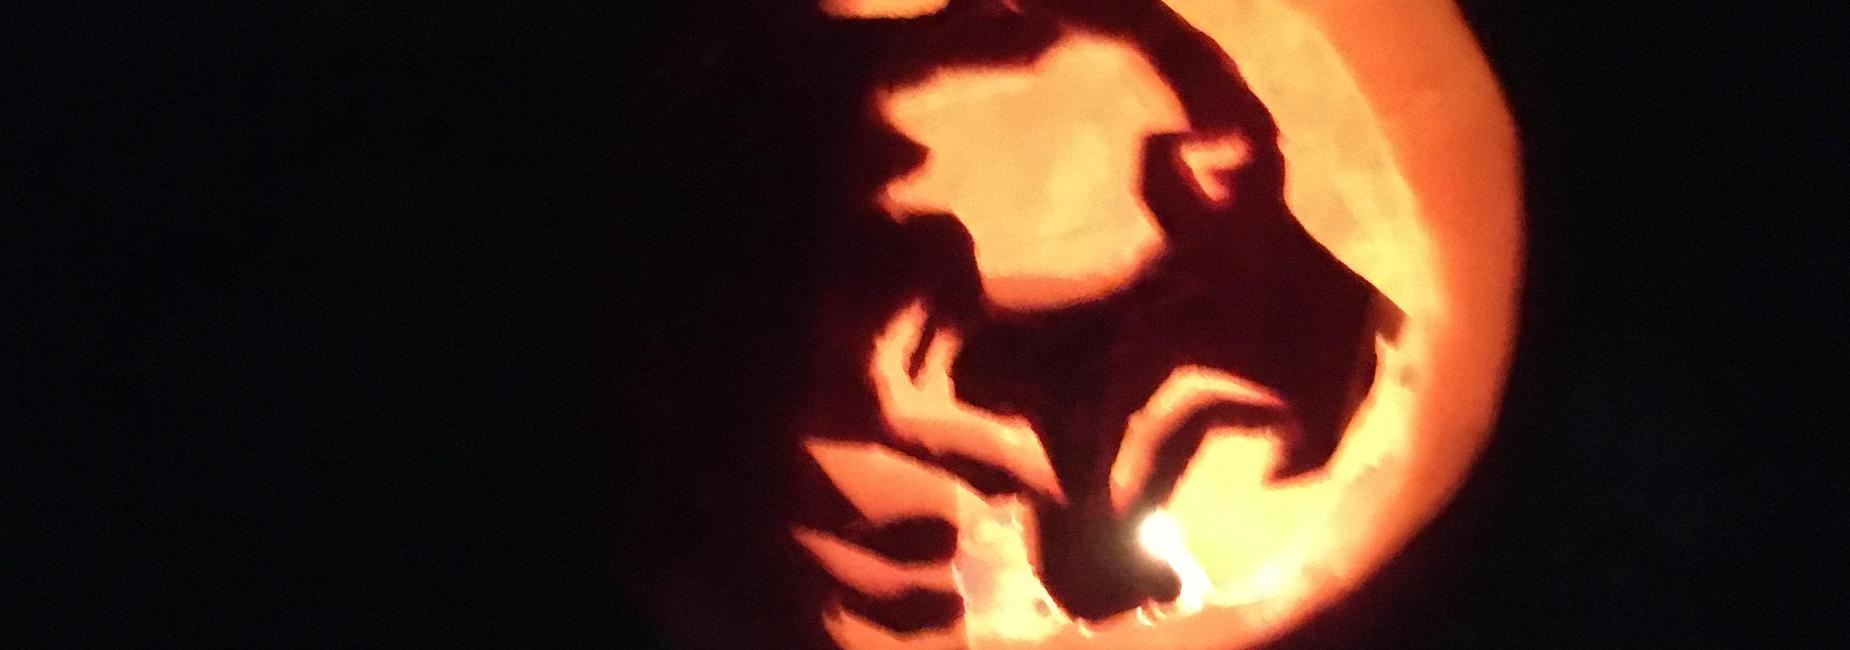 Bruin logo carved into a pumpkin.